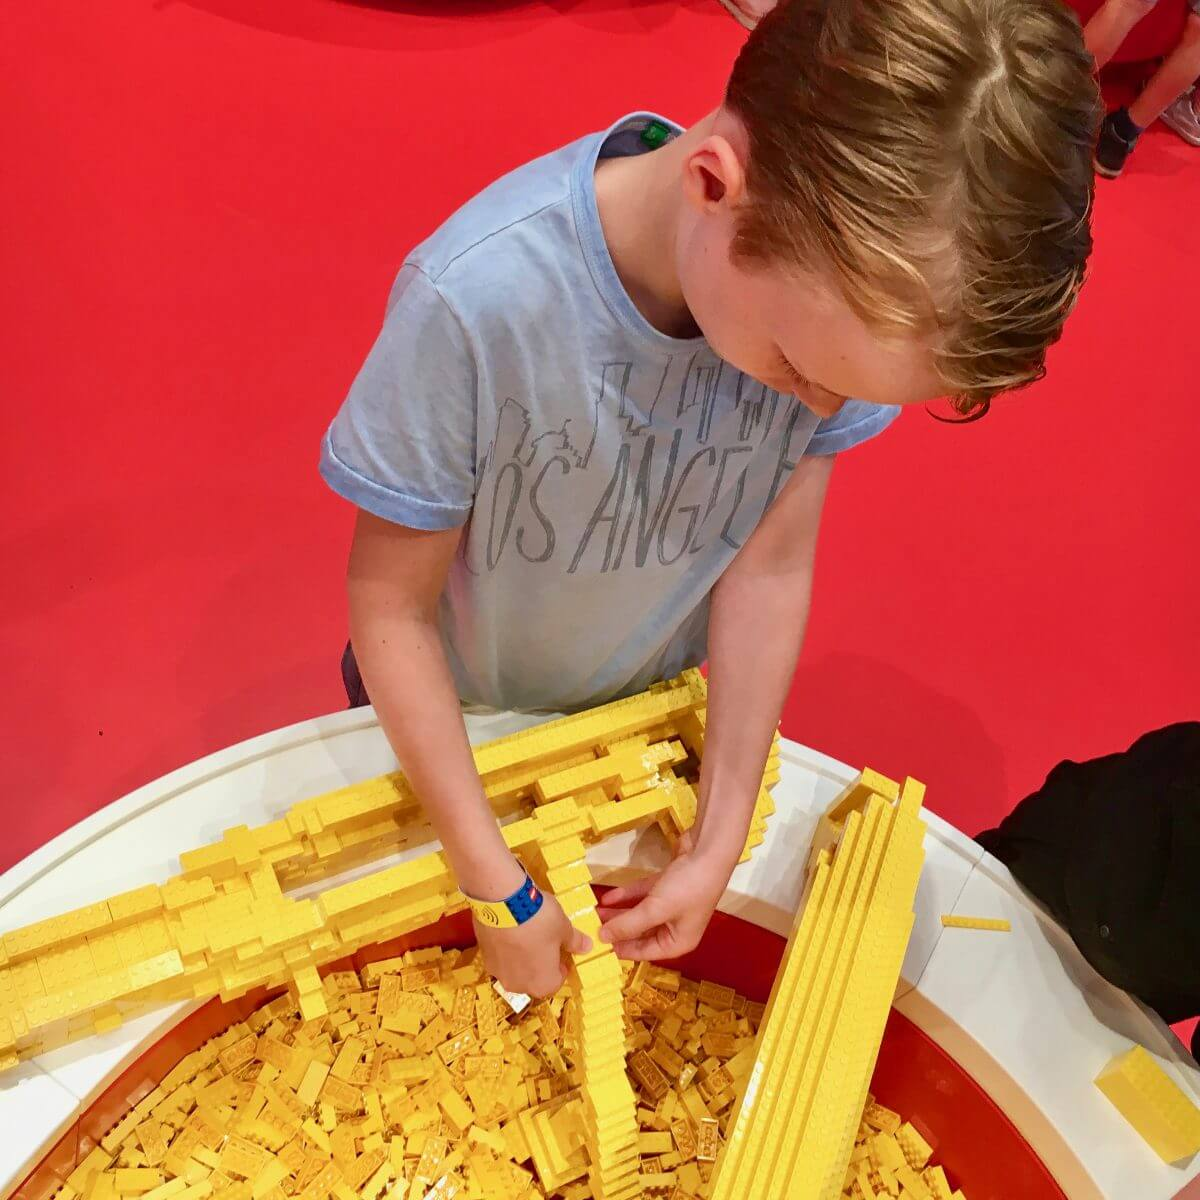 Bouwen in één kleur, zo gaaf! in LEGO House vlakbij Legoland Billund